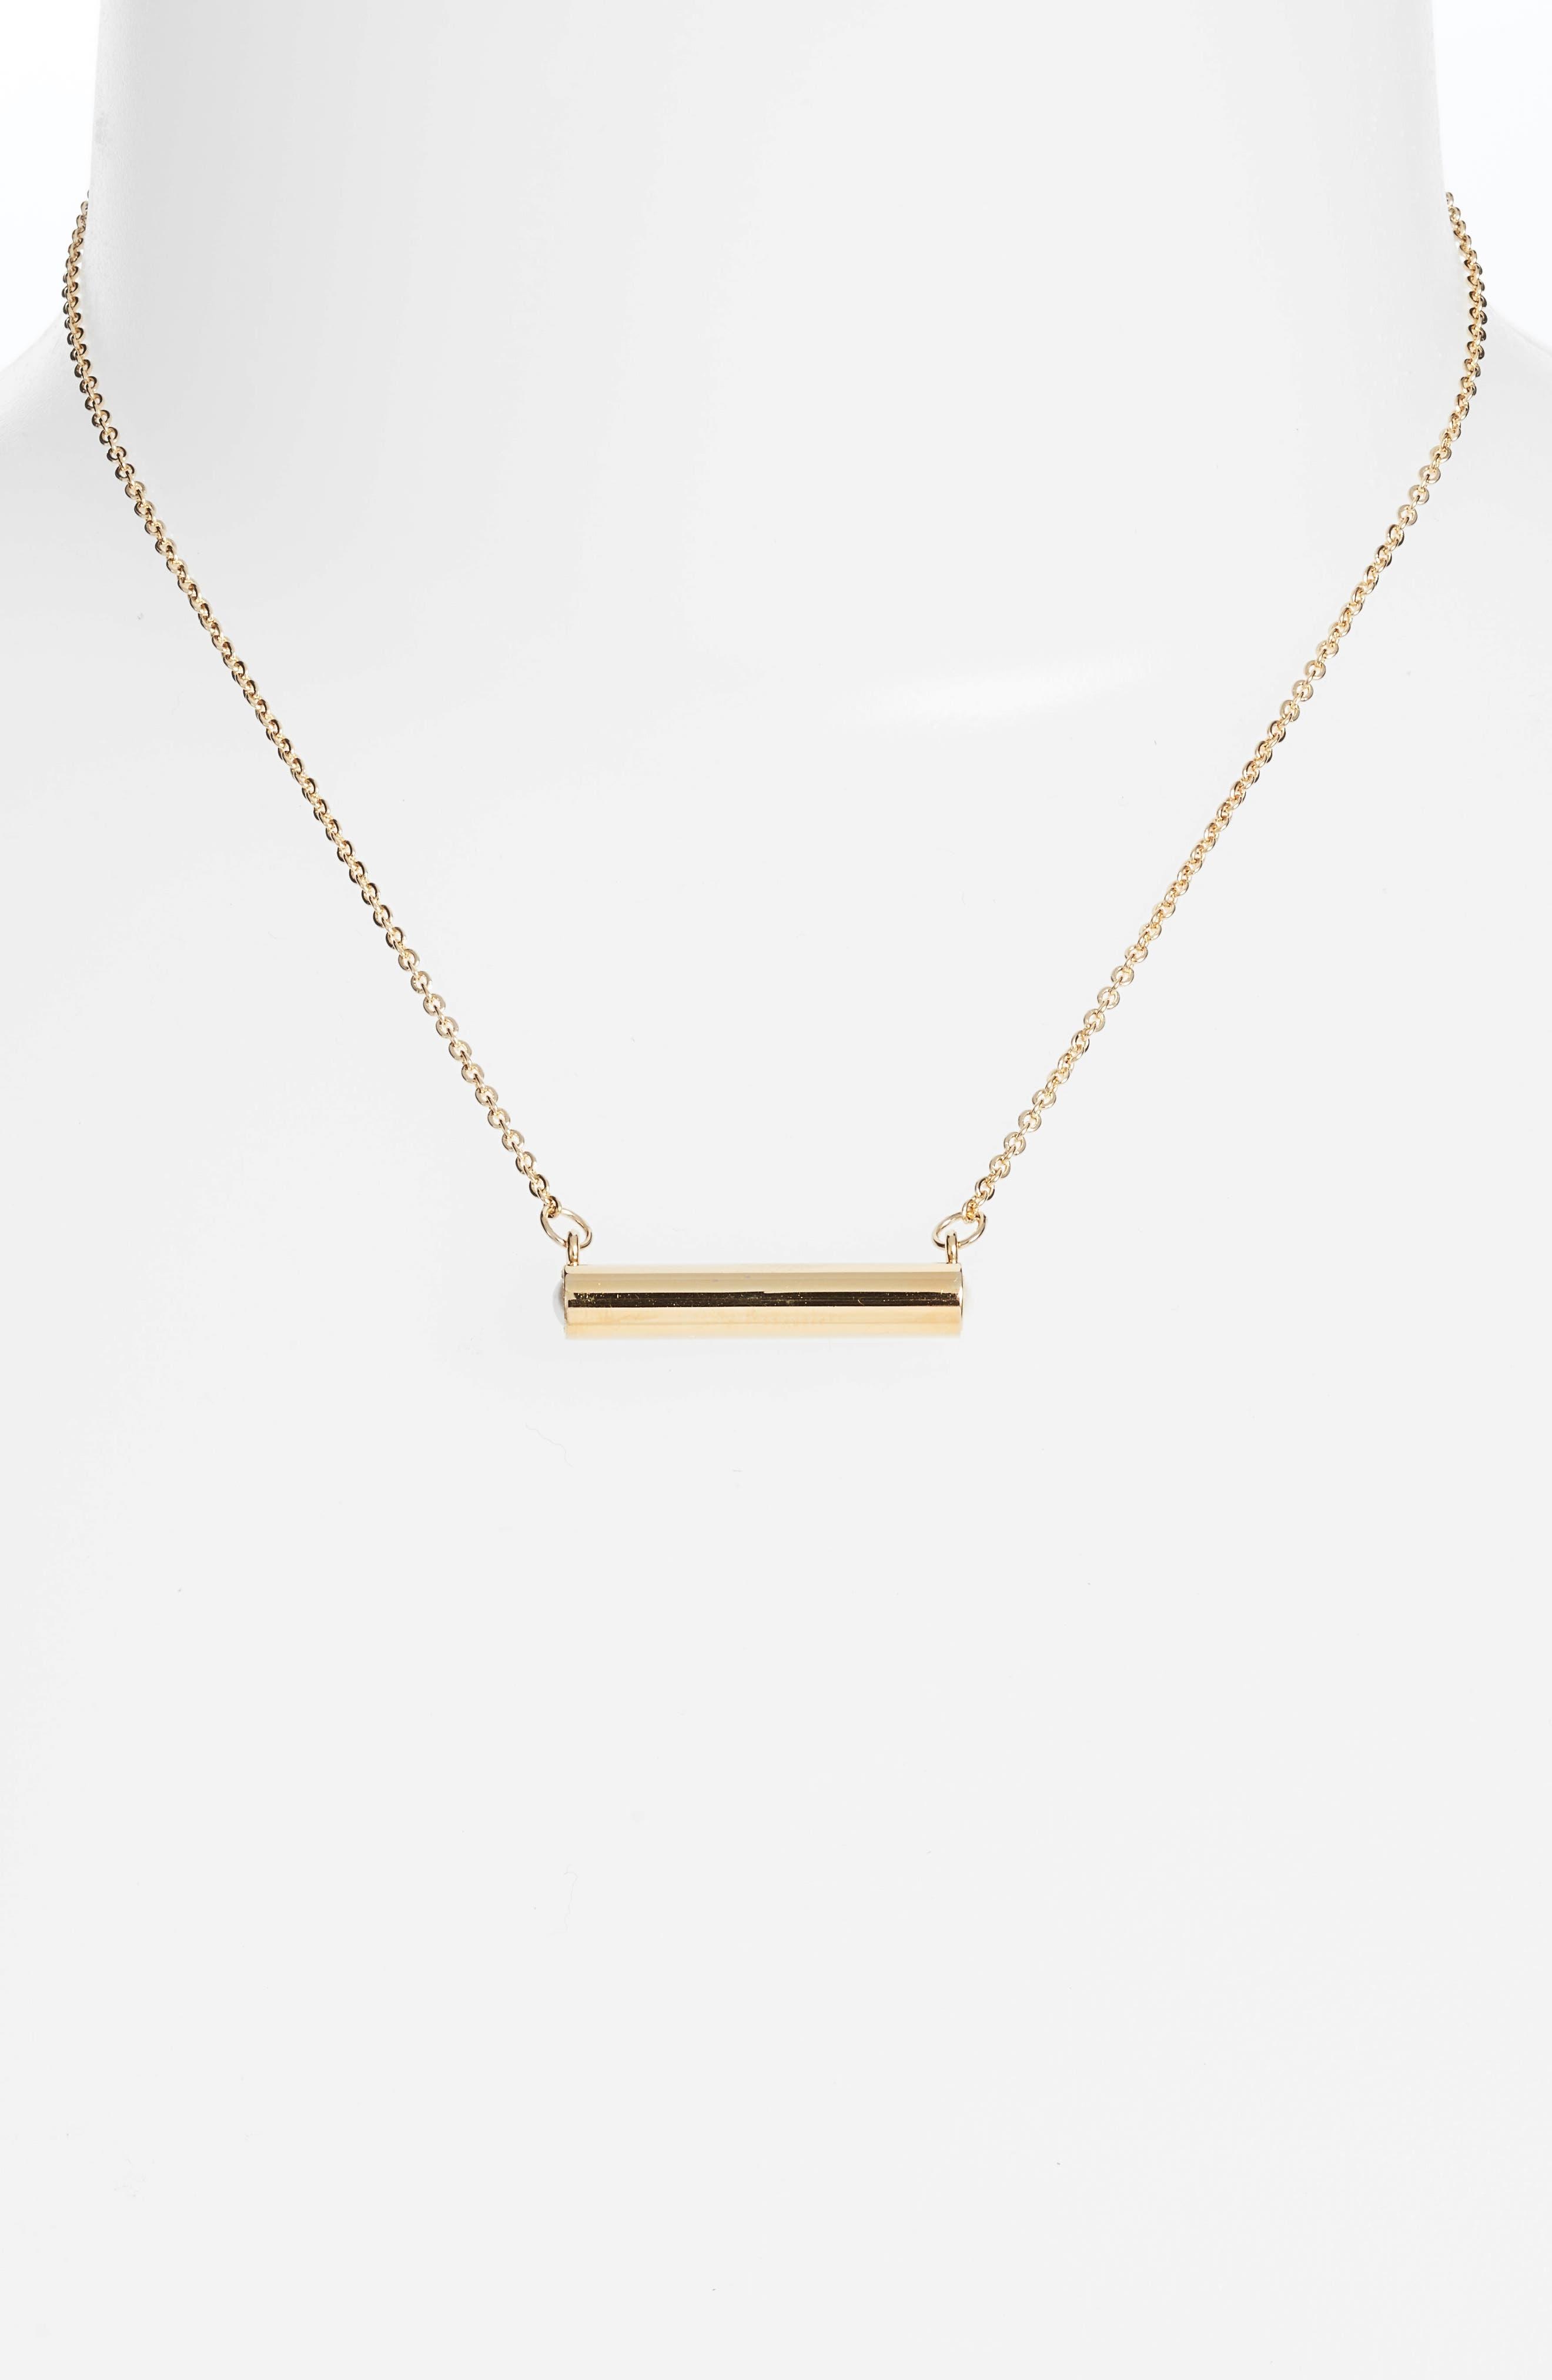 June Imitation Pearl Bar Pendant Necklace,                             Alternate thumbnail 2, color,                             Gold